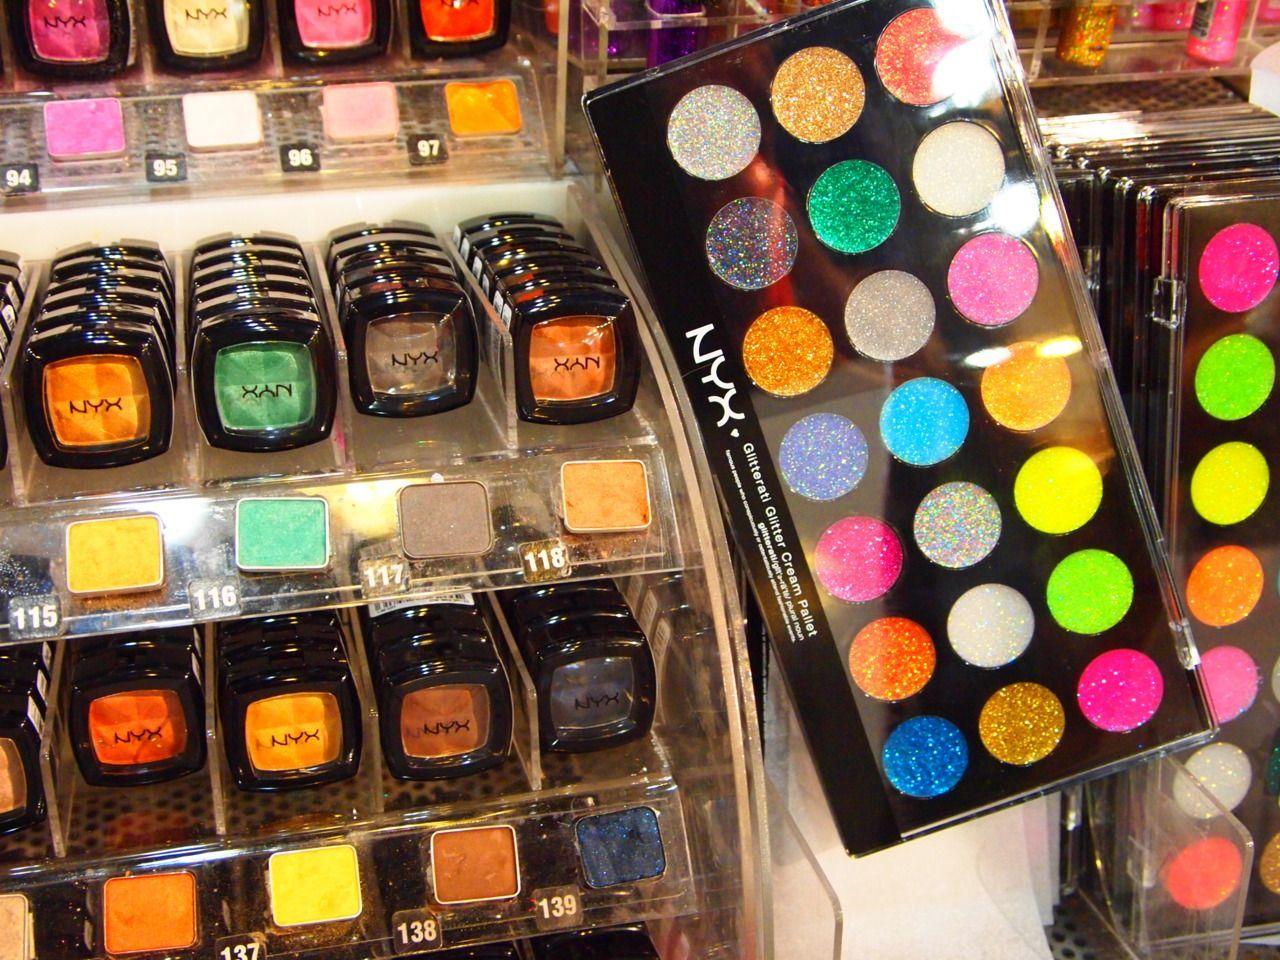 nyx cosmetics Nyx cosmetics, Nyx makeup, Makeup cosmetics